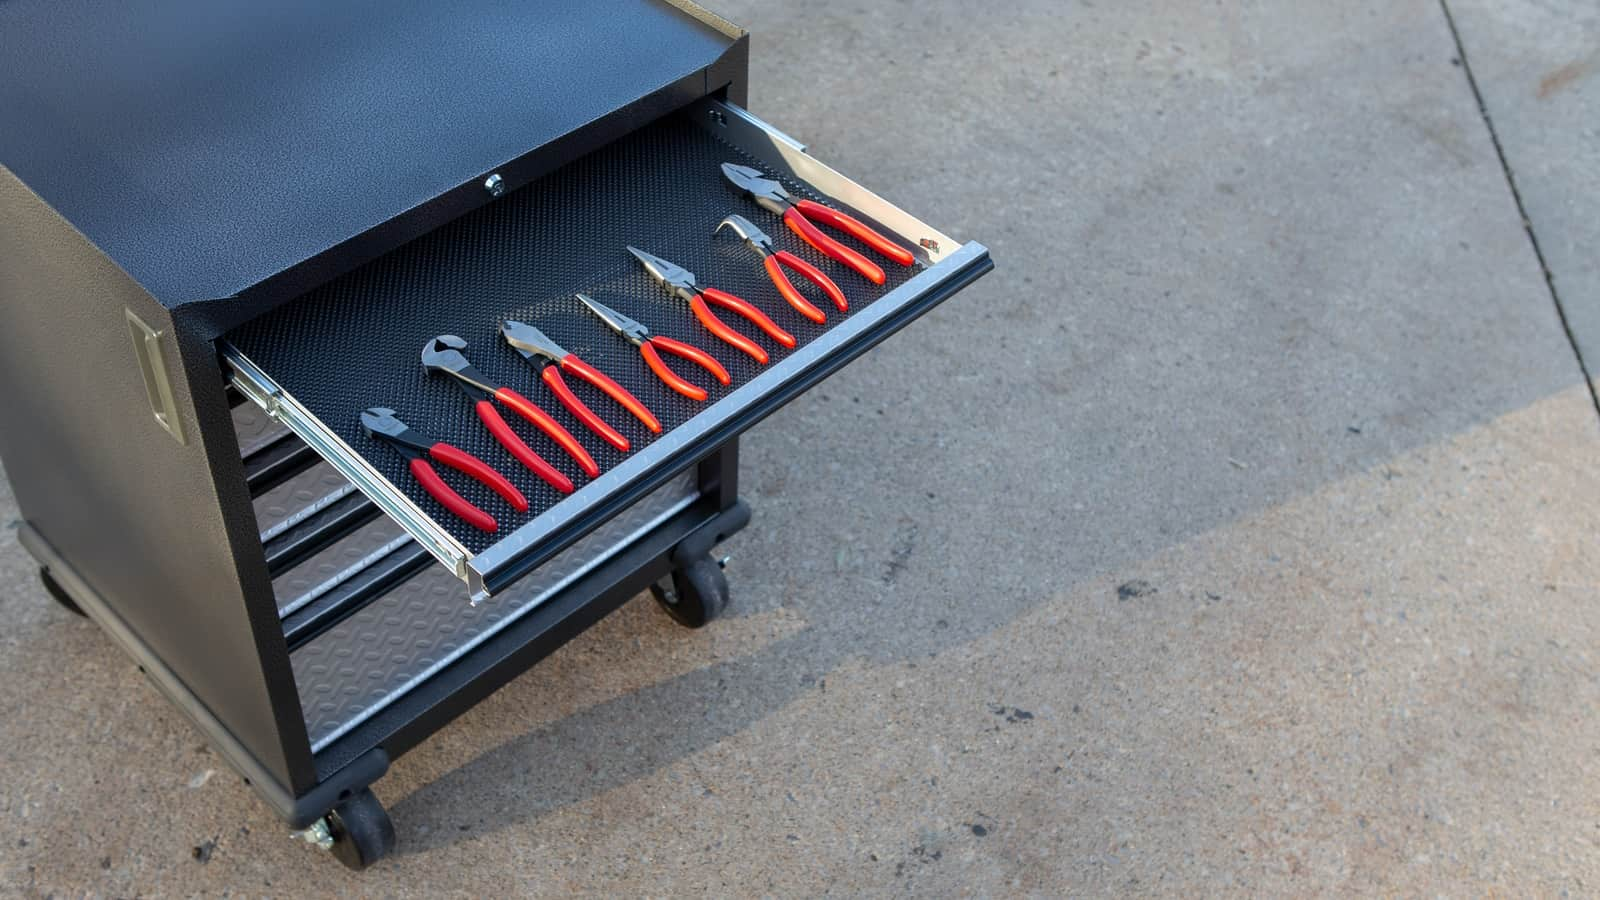 herramientas ordenadas